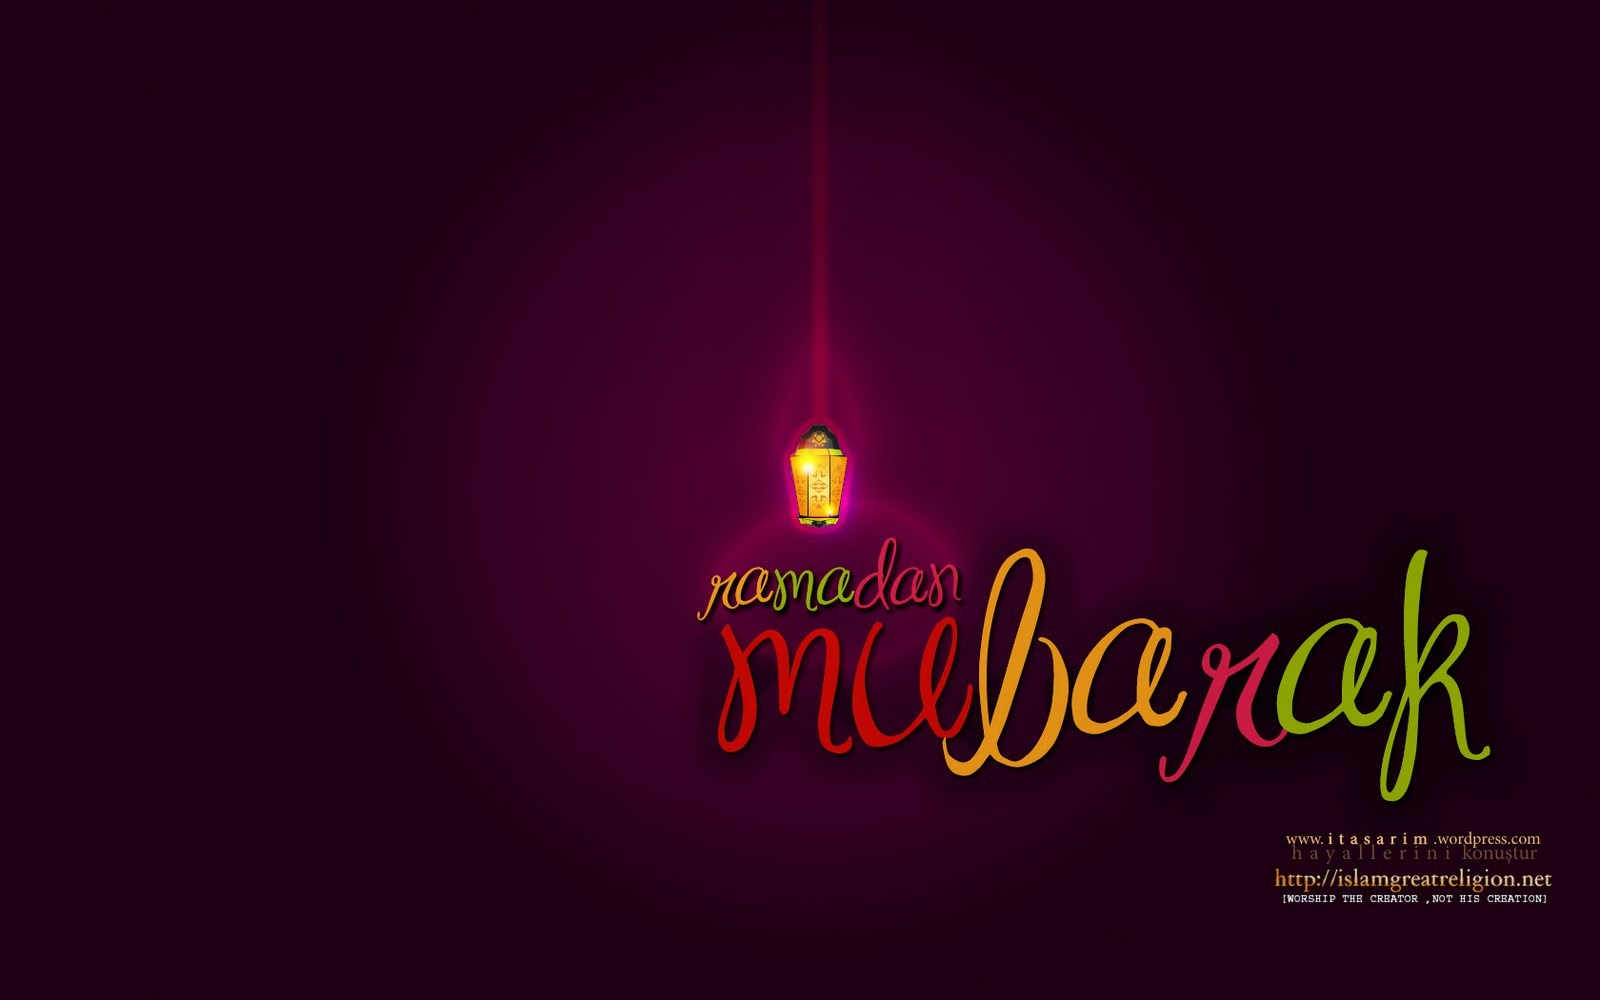 http://4.bp.blogspot.com/-lzvn0Q1xzUA/Tjrz2Ca7AxI/AAAAAAAADZI/O7FU2sNxLPE/s1600/ramadan_mubarak_2011.jpg